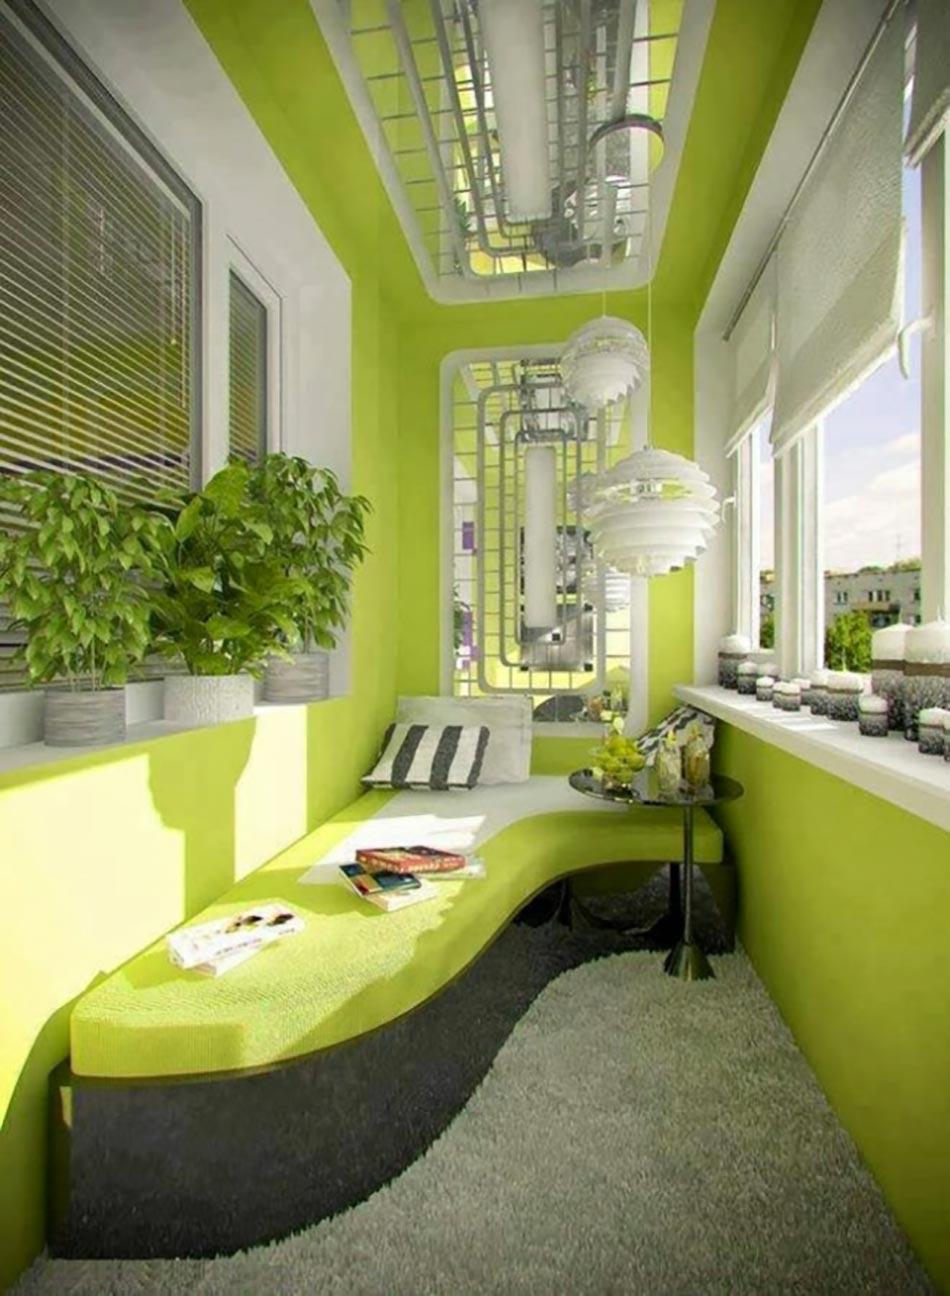 15 projets int ressants afin de mieux am nager son balcon. Black Bedroom Furniture Sets. Home Design Ideas